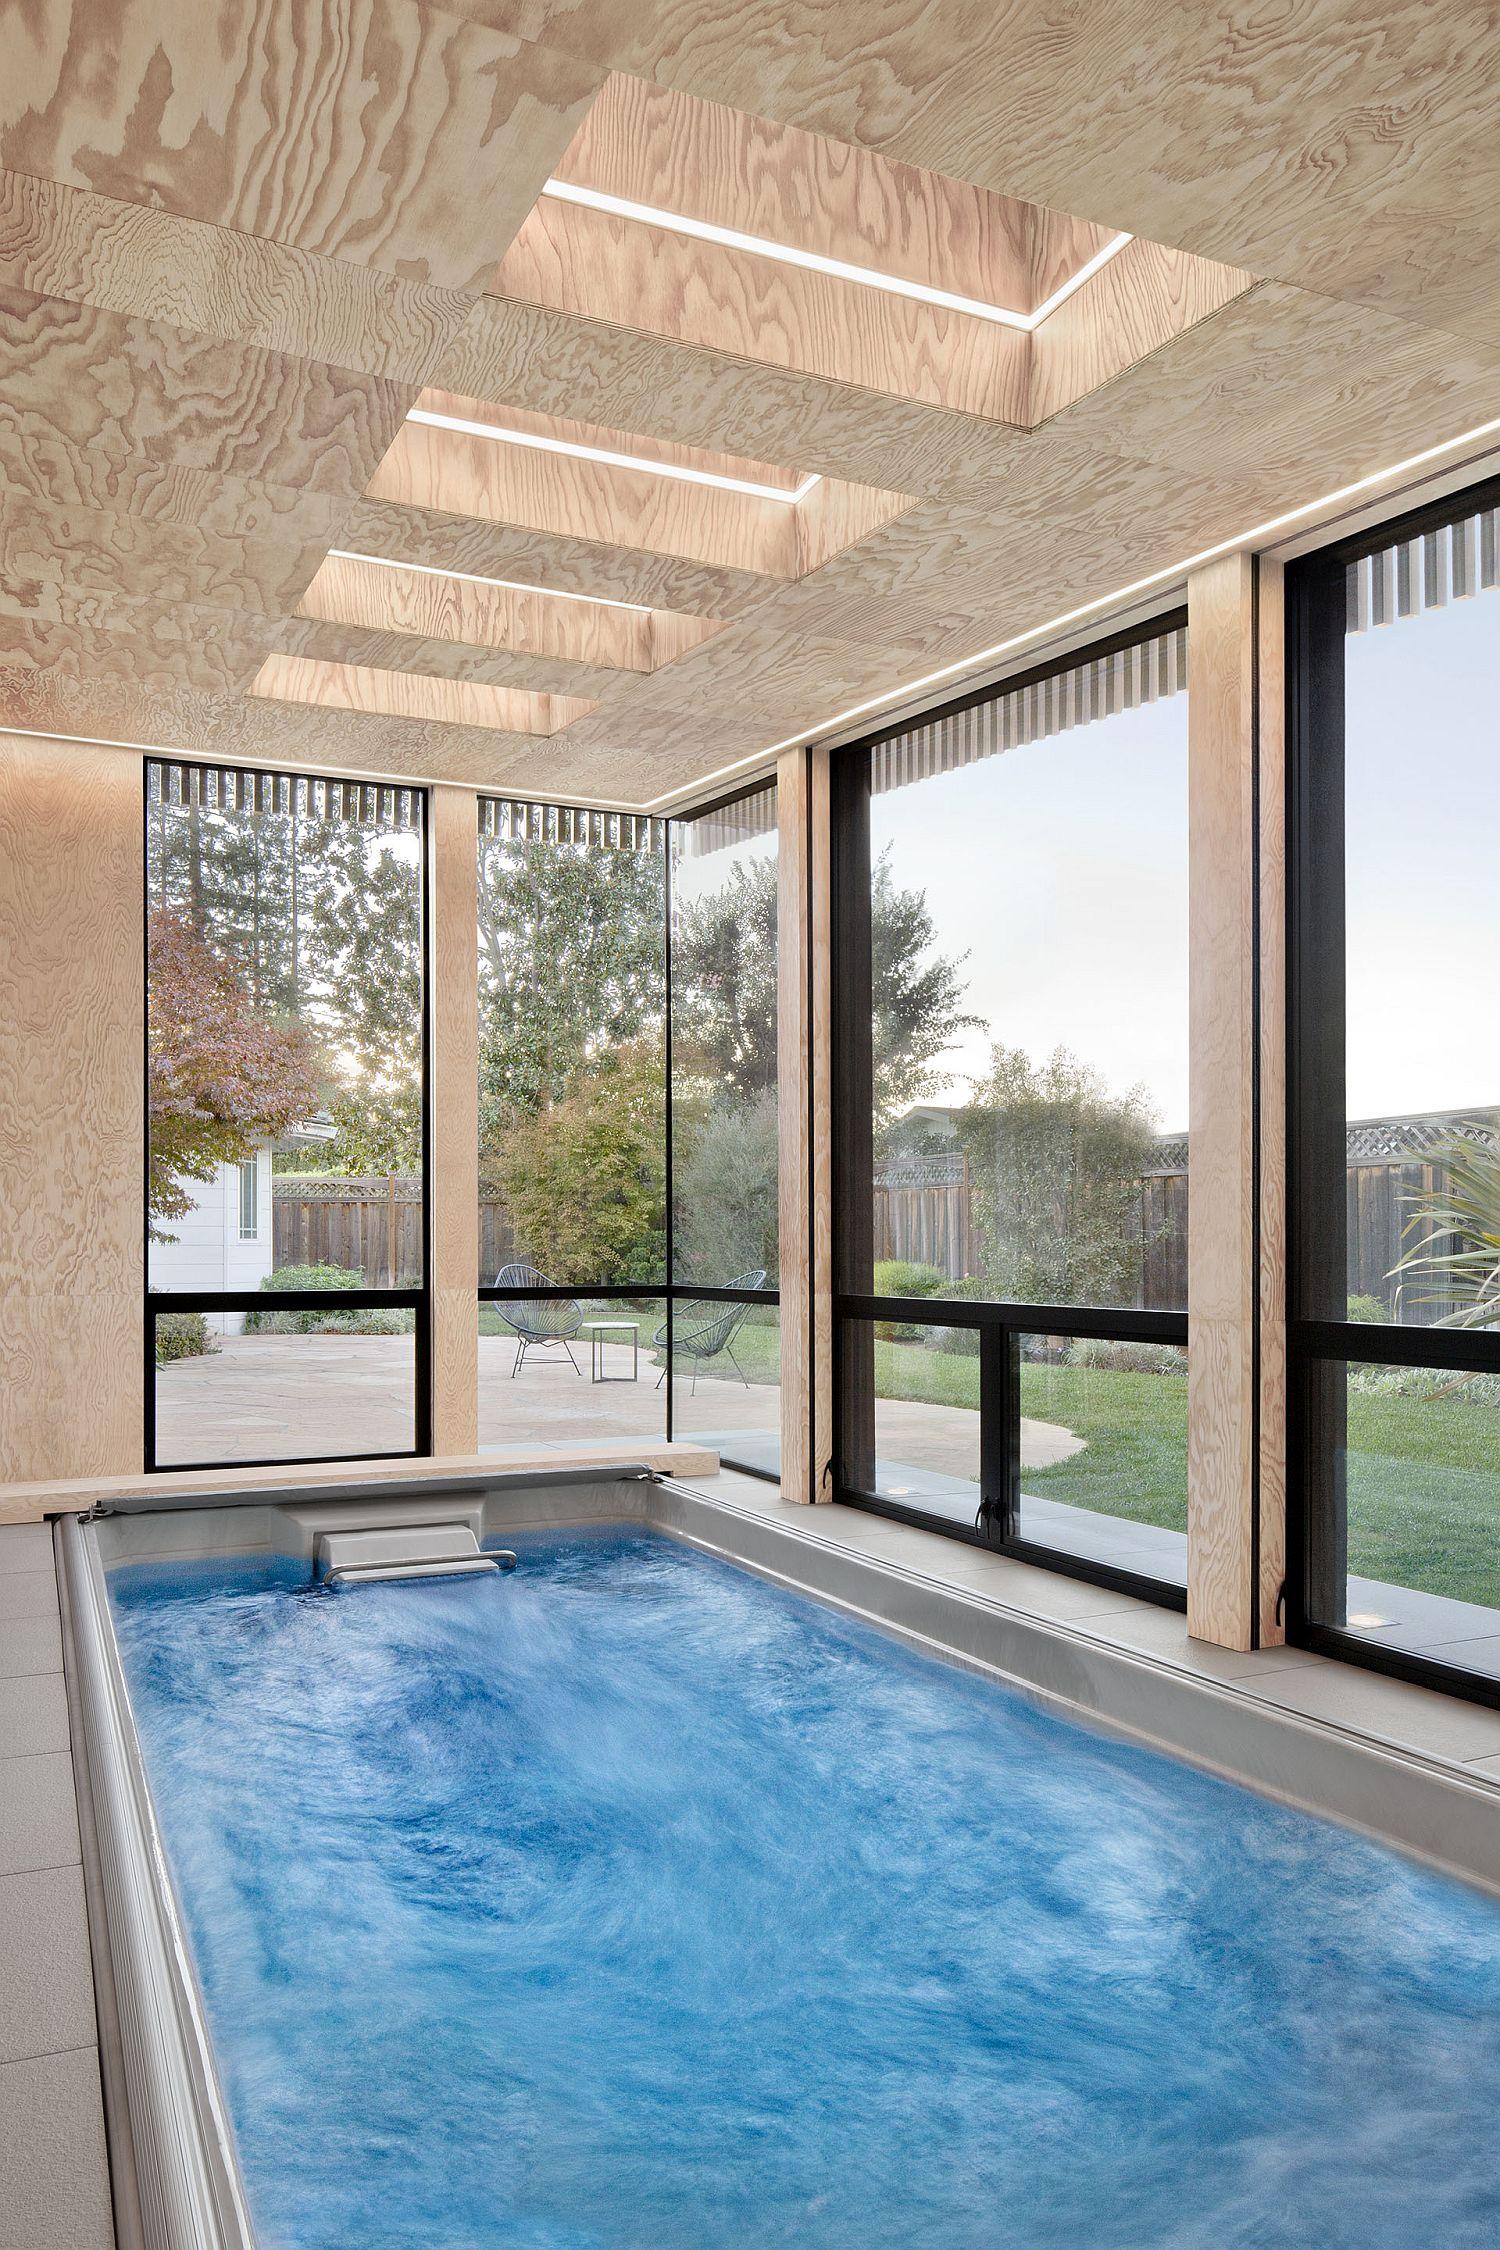 Slim and elegant design of the pool house